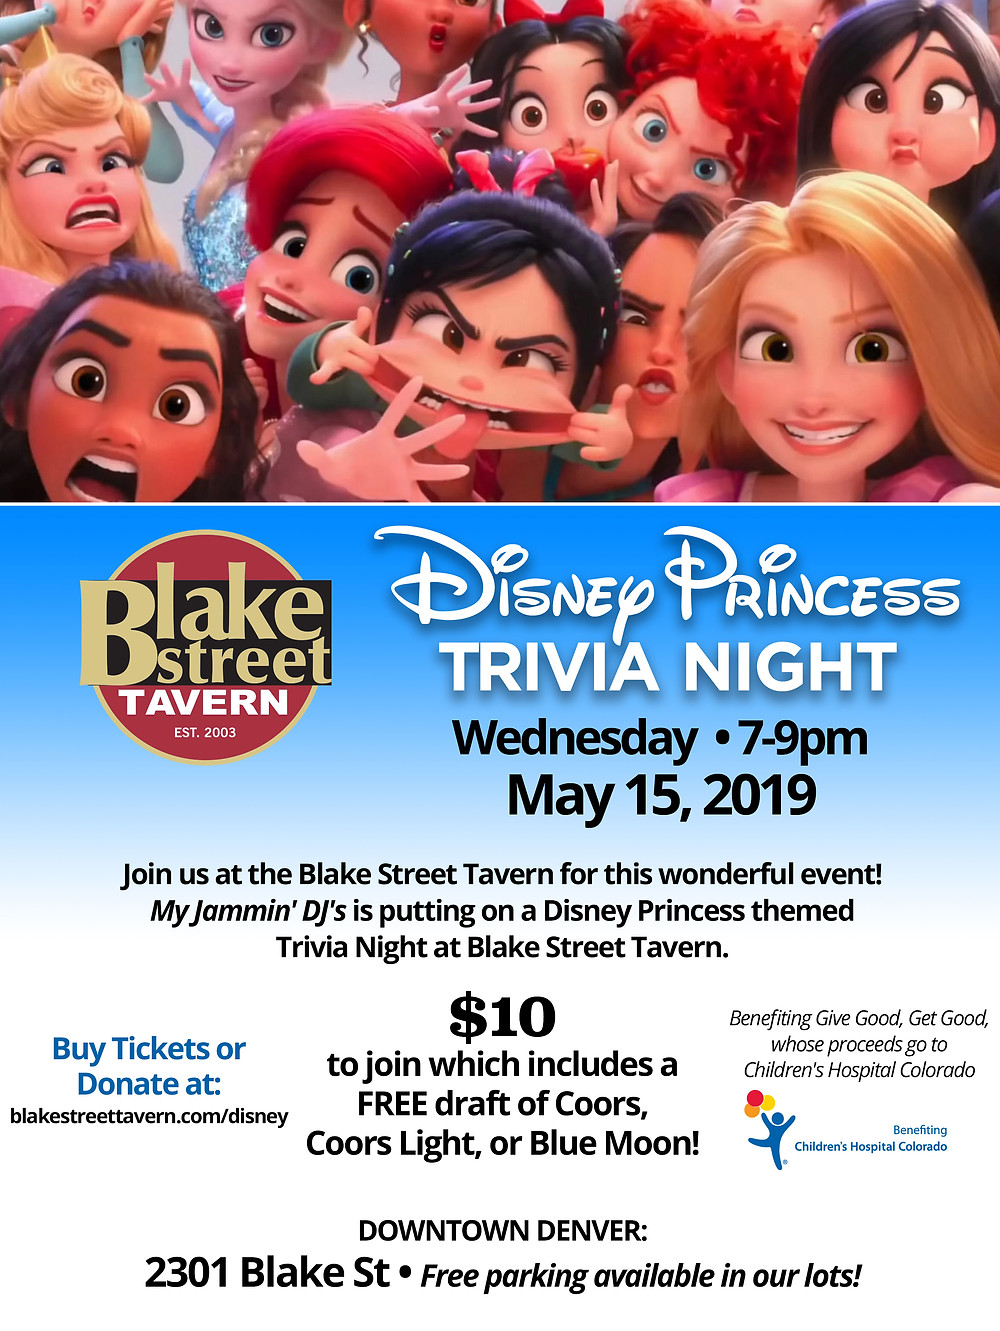 Disney Trivia in Denver at Blake Street Tavern